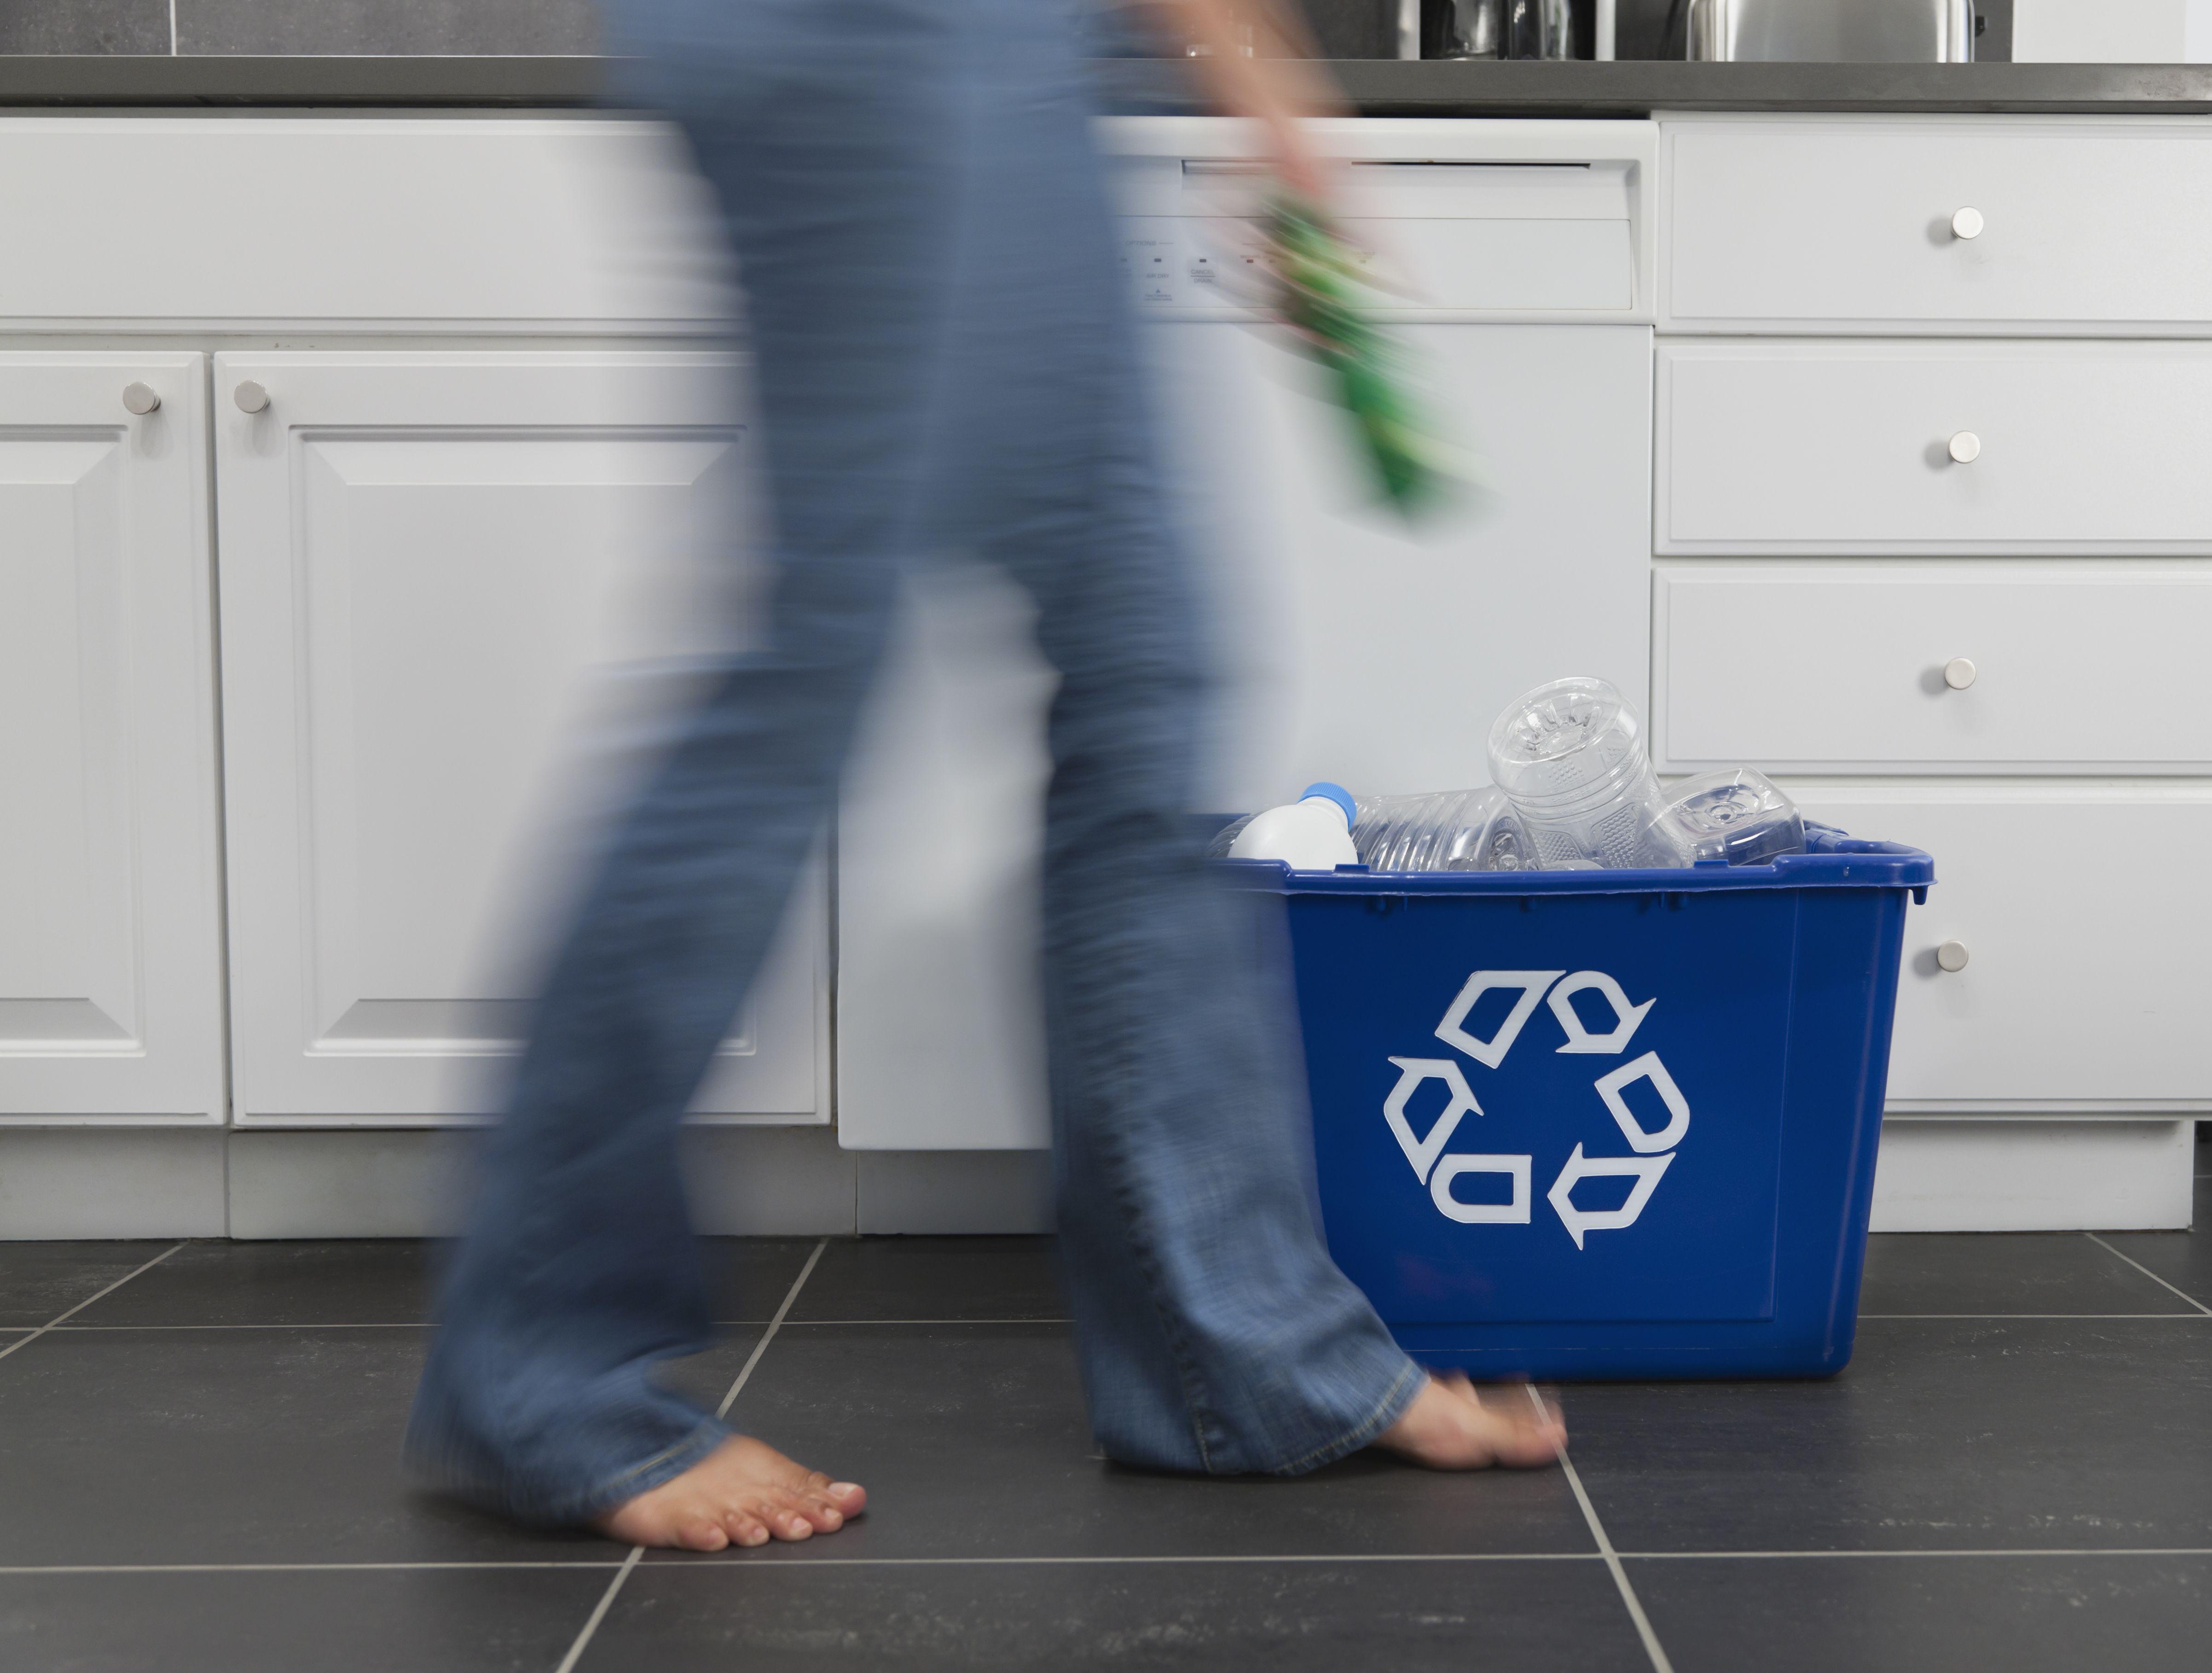 Hispanic Woman Putting Plastic Bottle In Recycling Bin